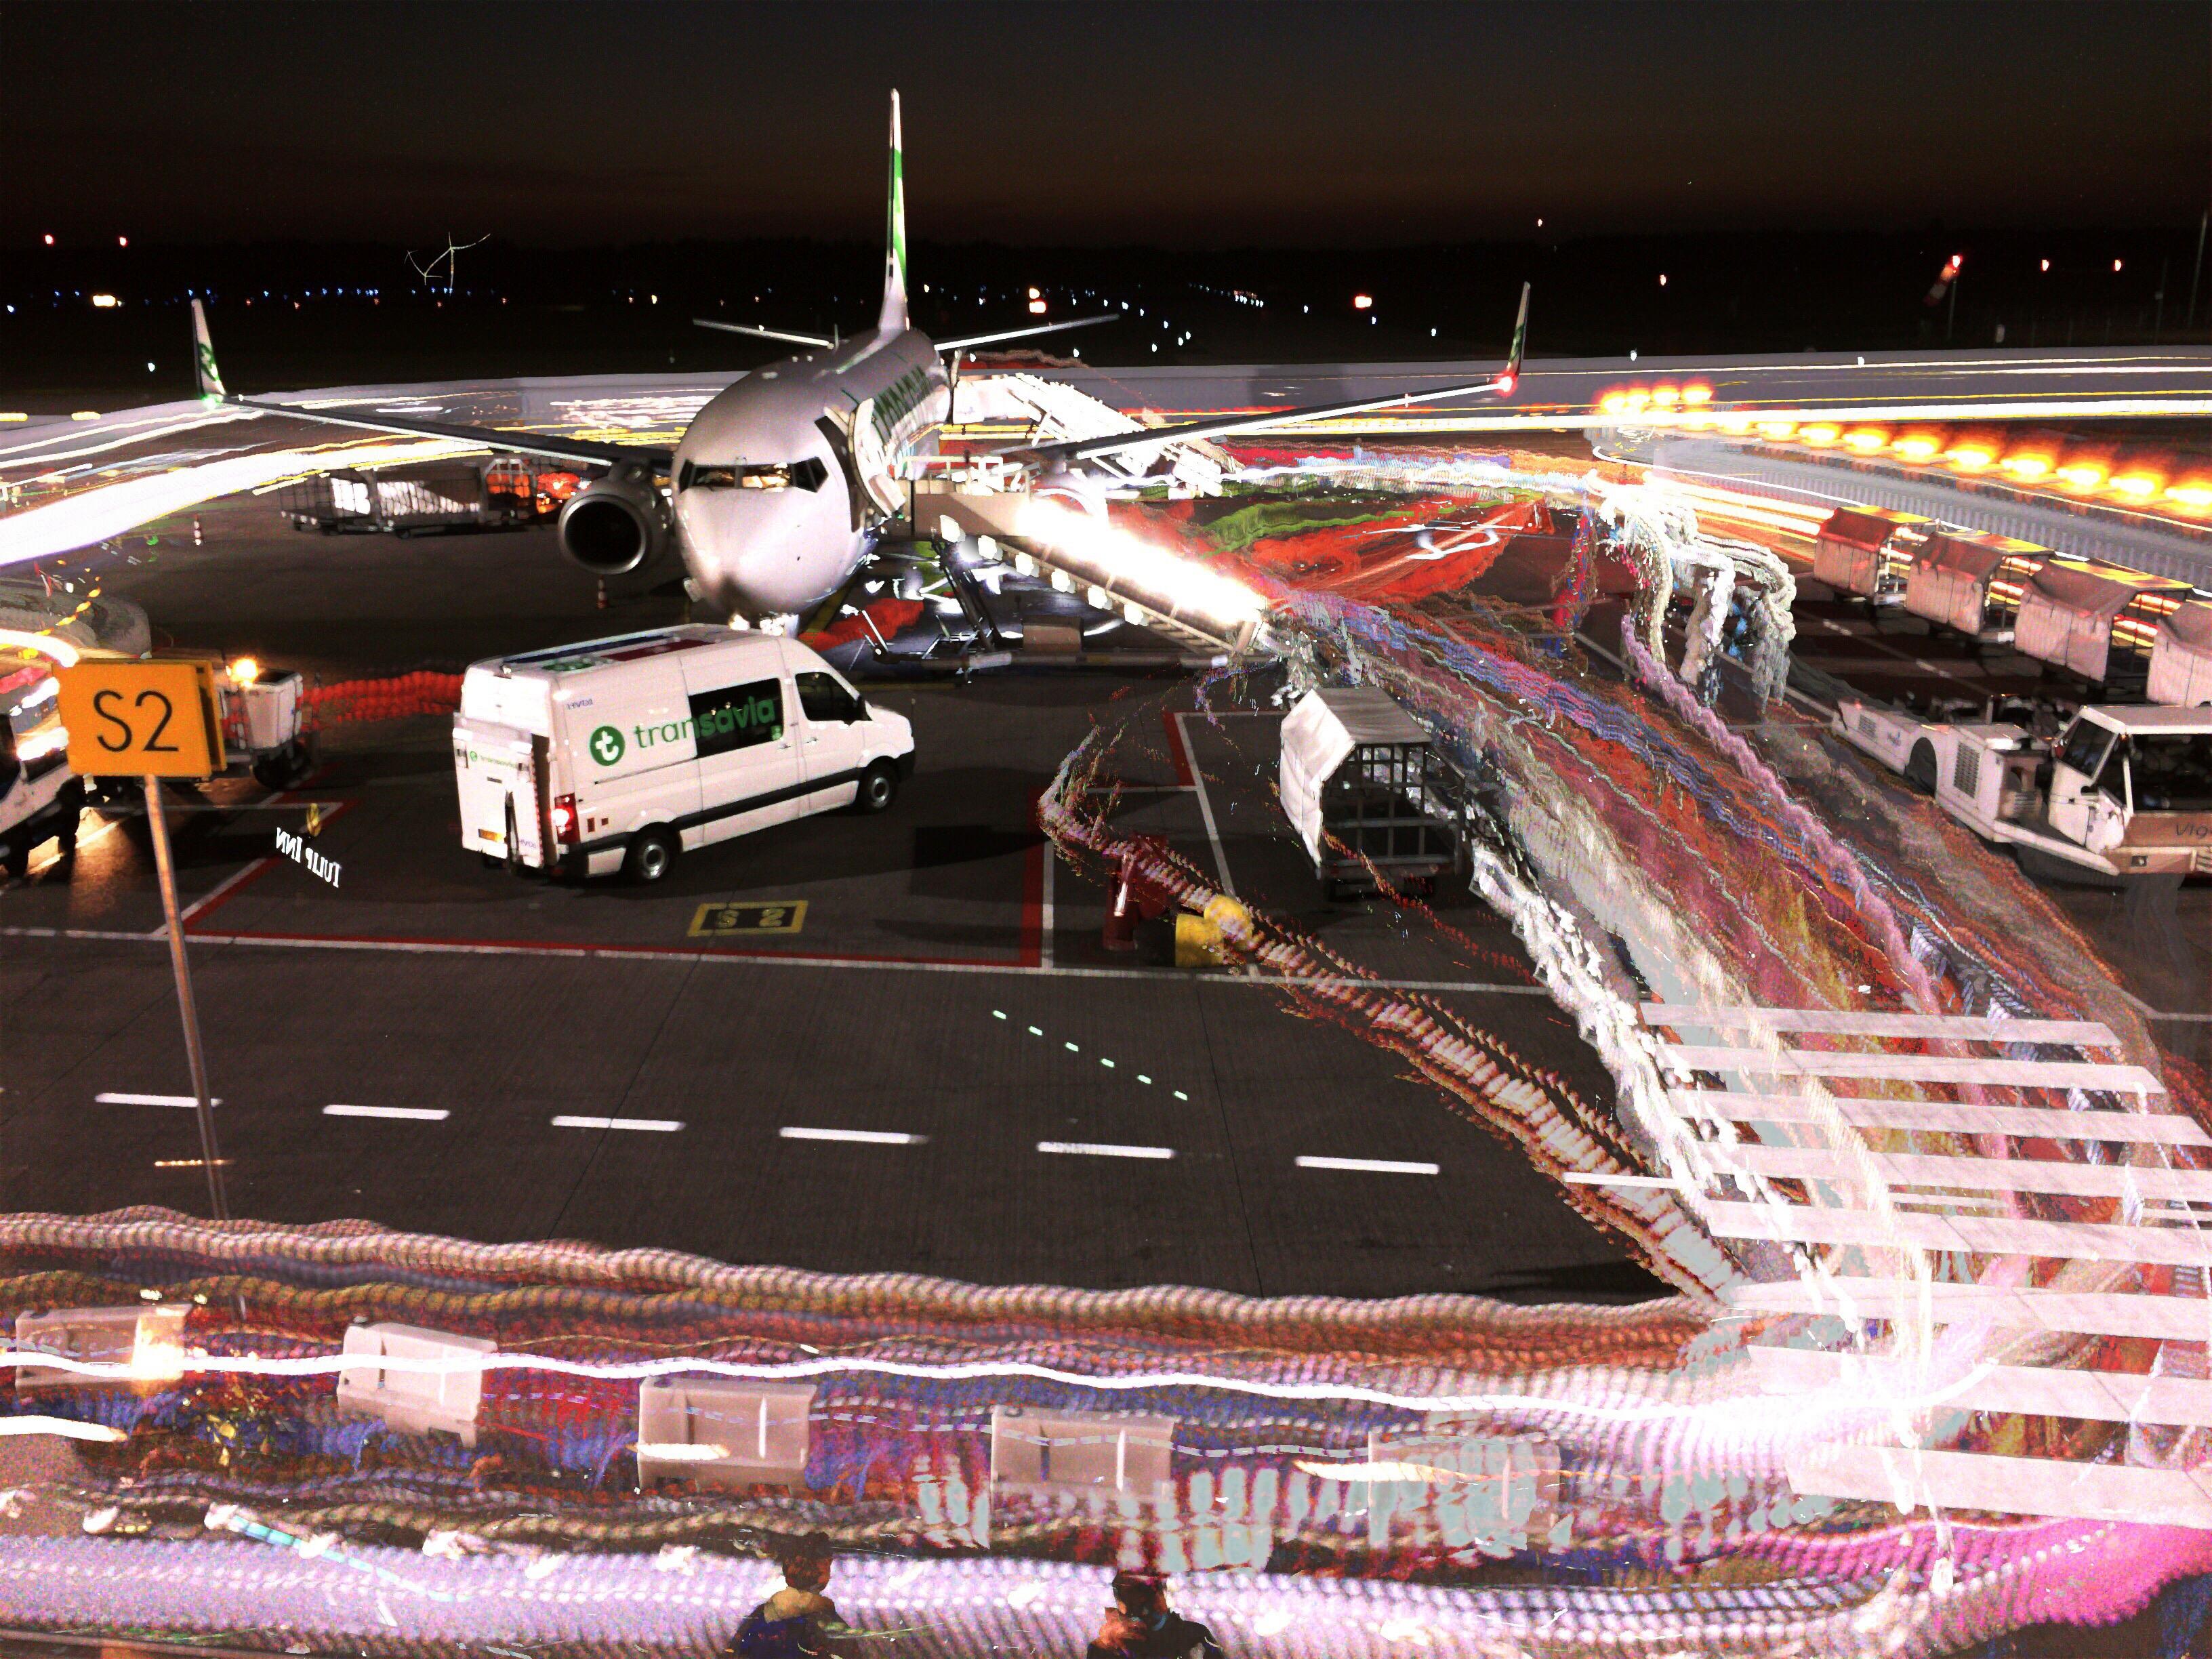 Eindhoven Airport 2016